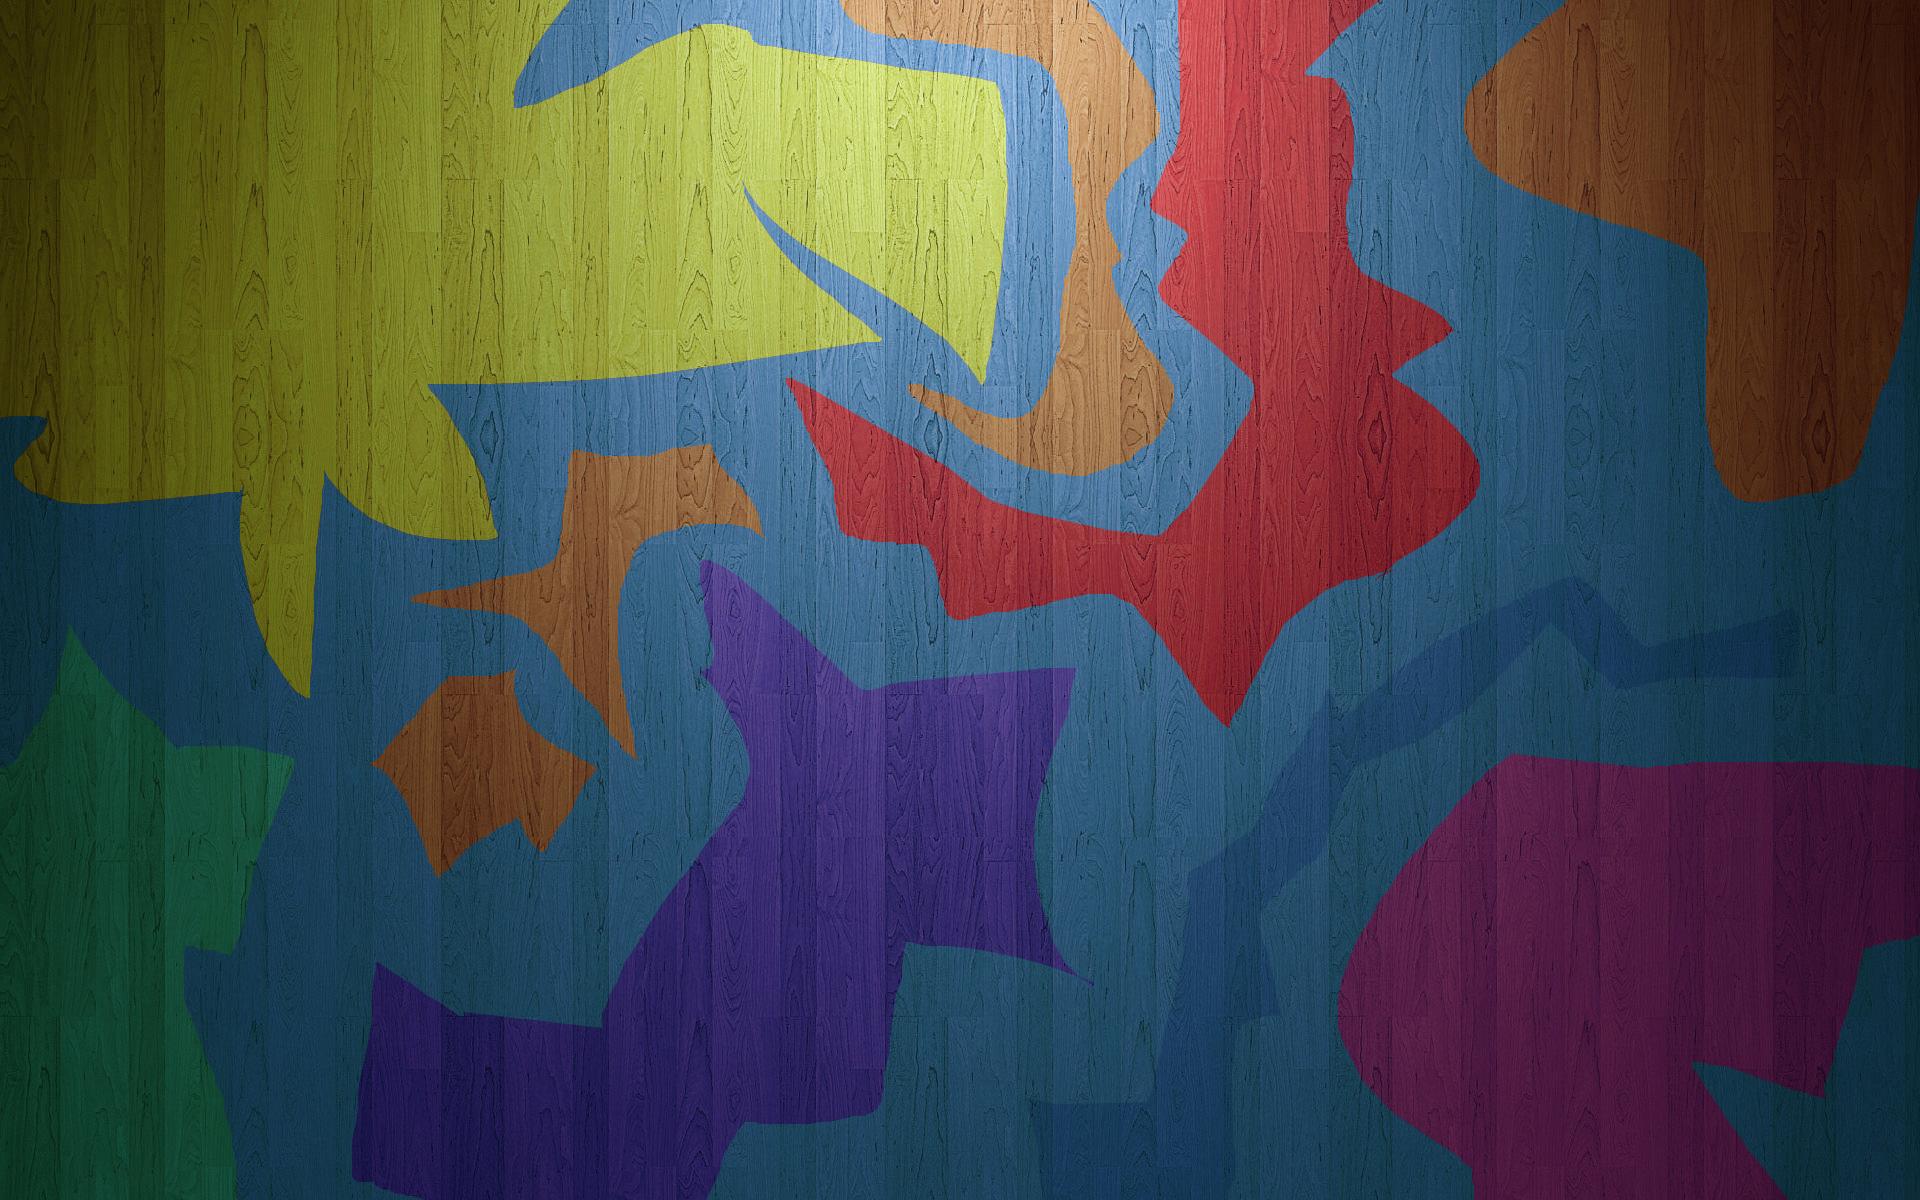 Colored wood by MeGustaDeviantart